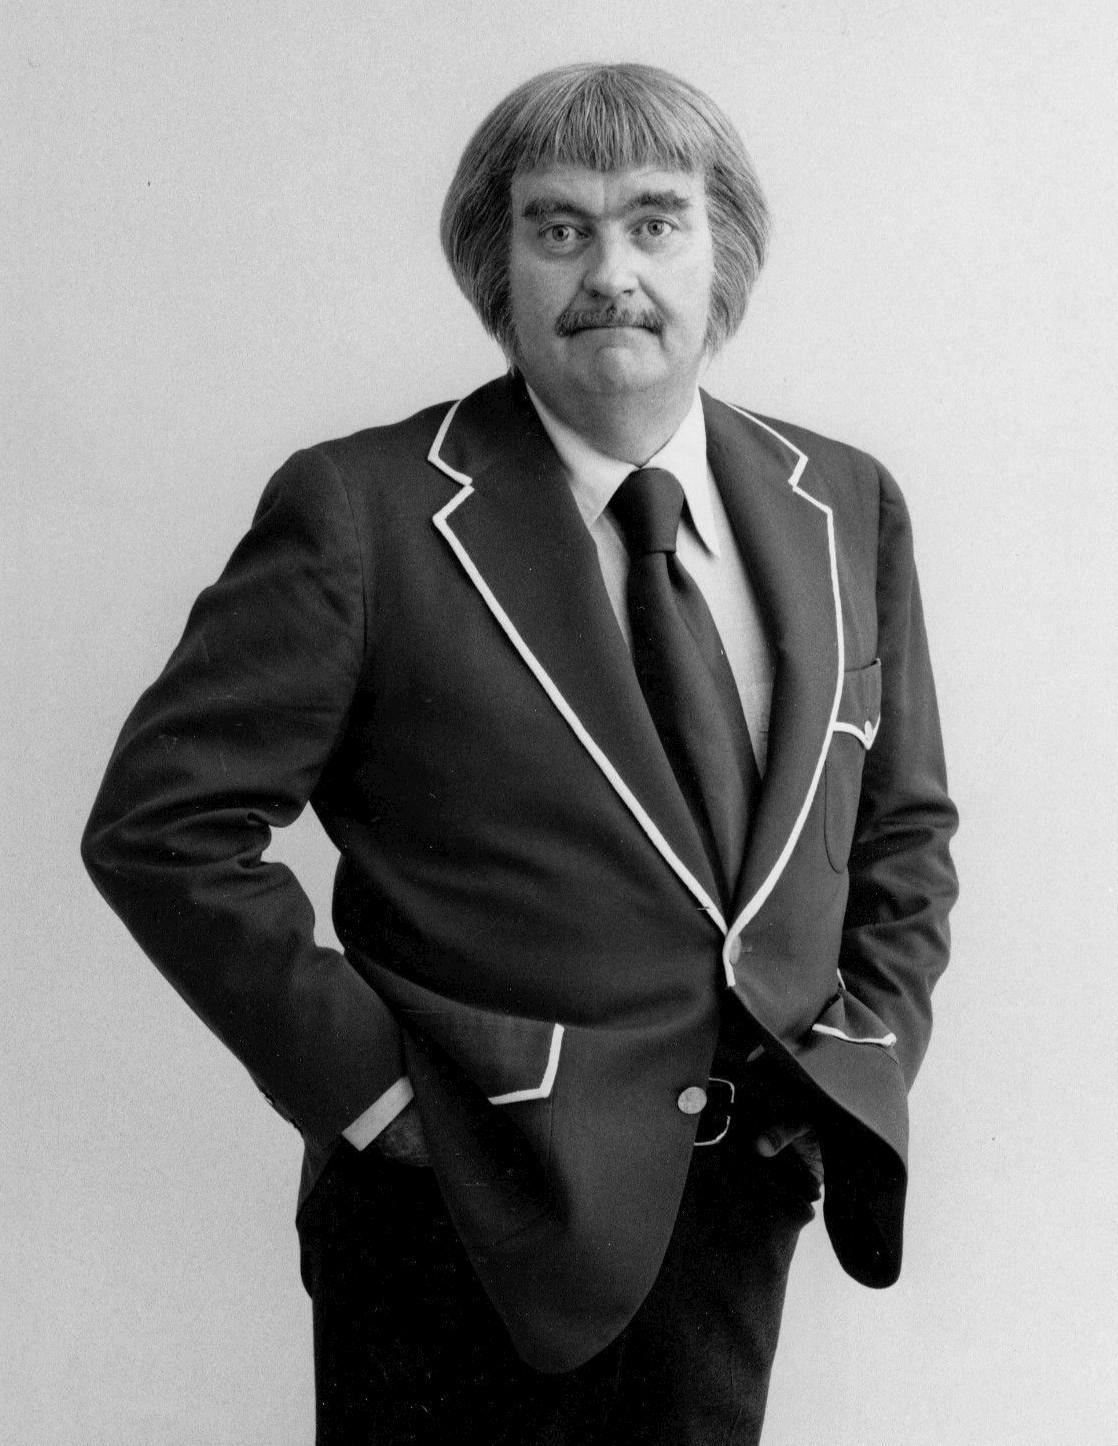 Bob_keeshan_captain_kangaroo_1977 -